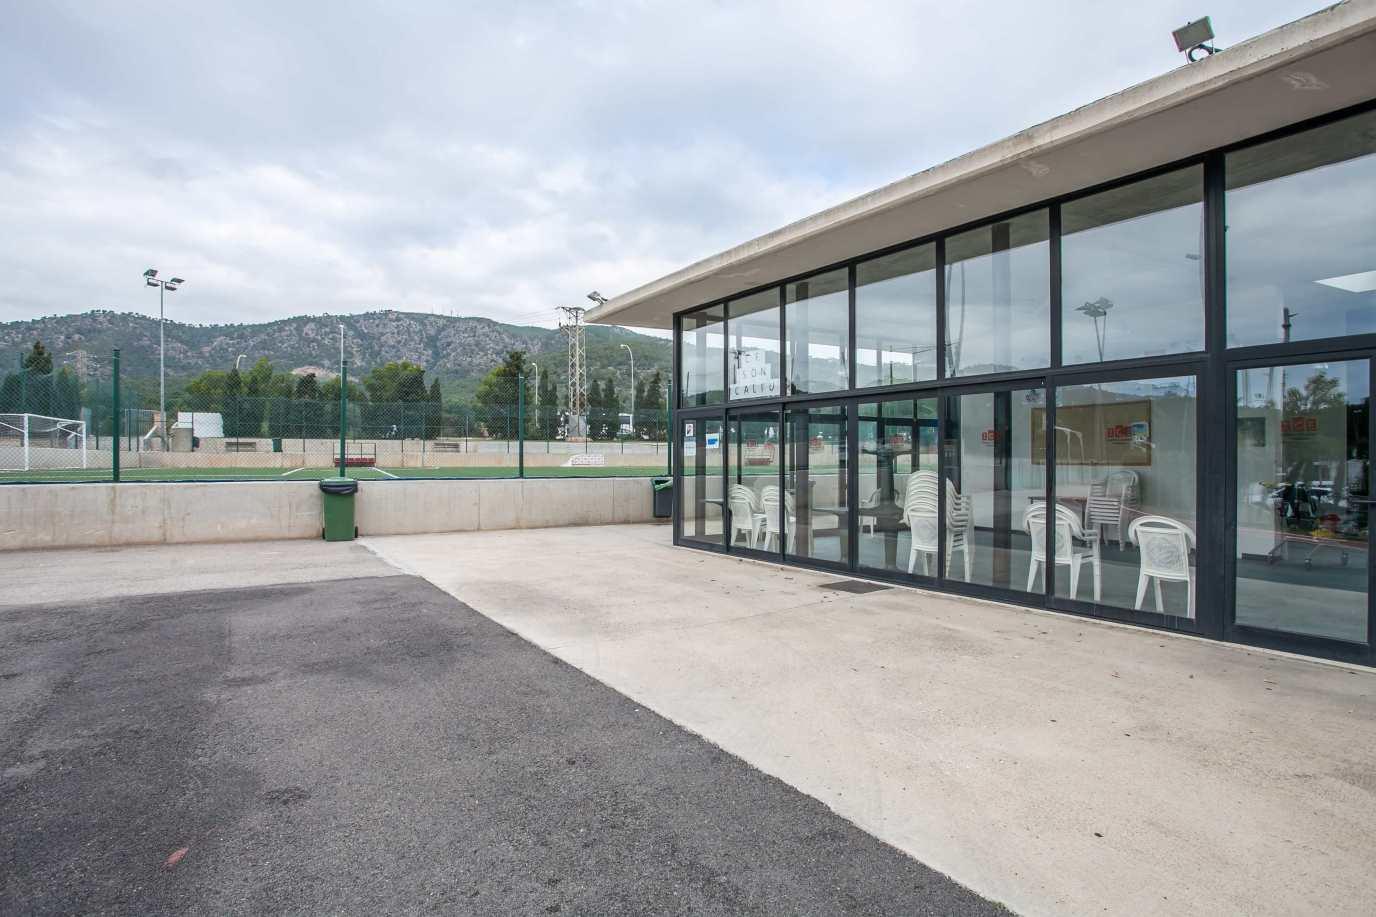 Zona polideportiva de Son Caliu- Instalaciones deportivas de Calvià